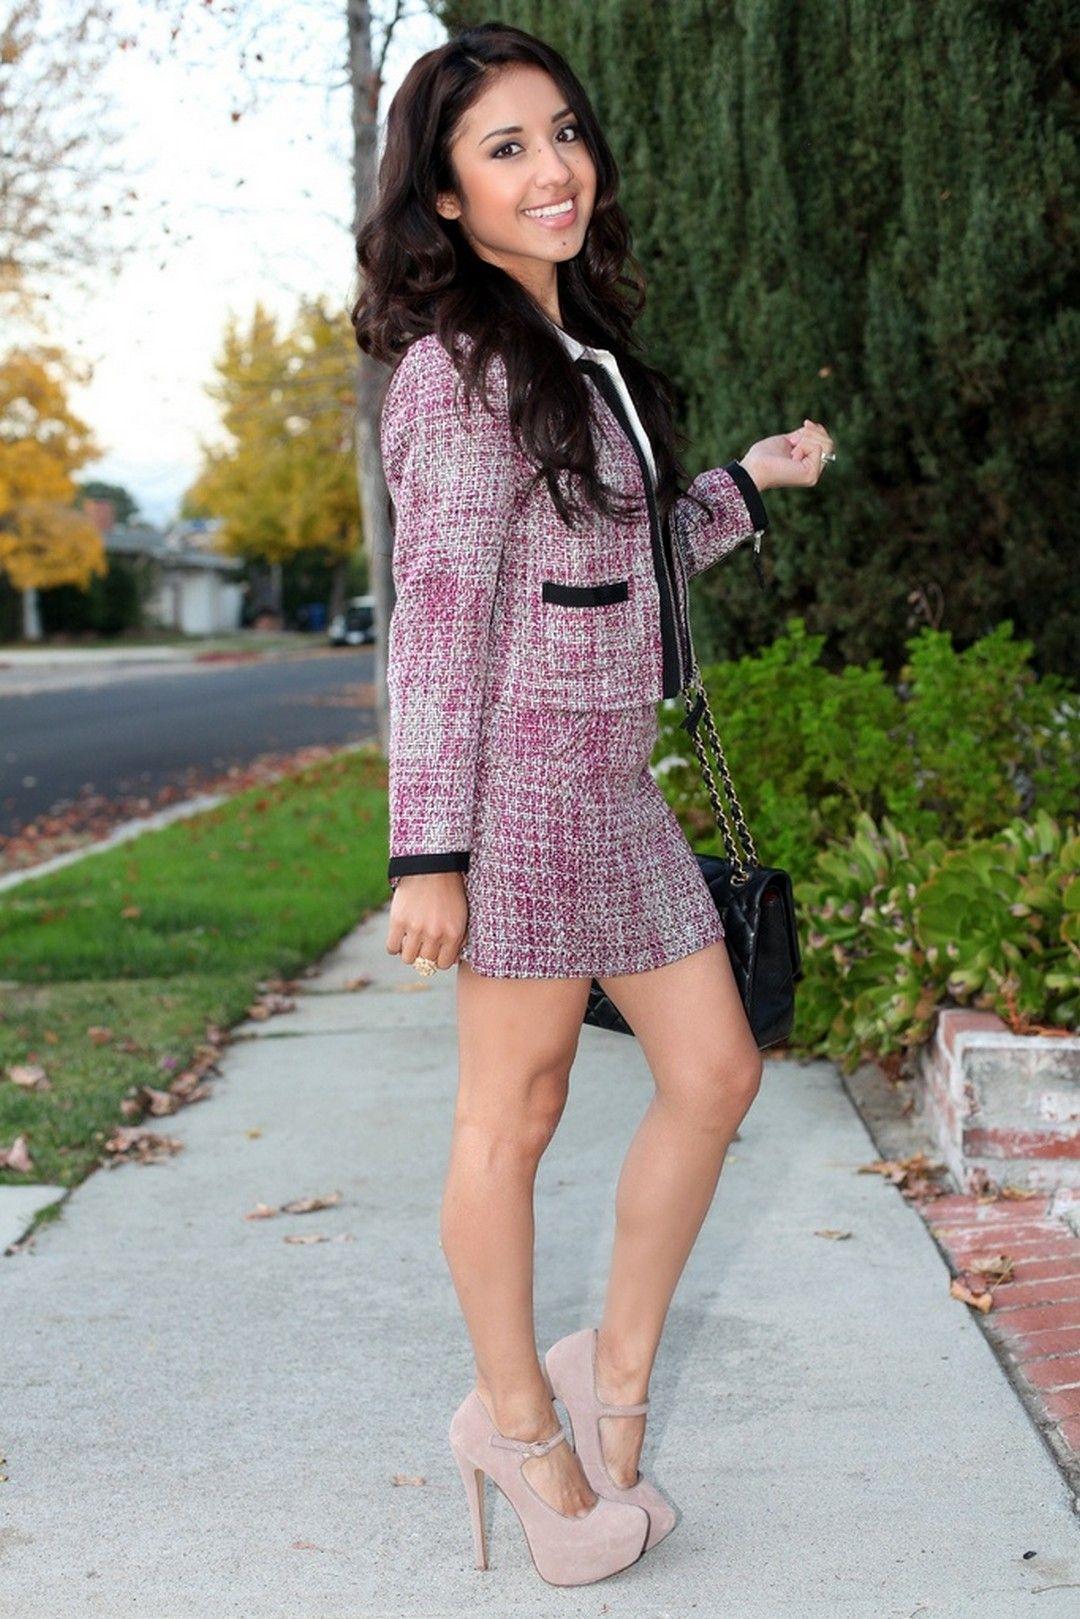 women skirts high heels - photo #33